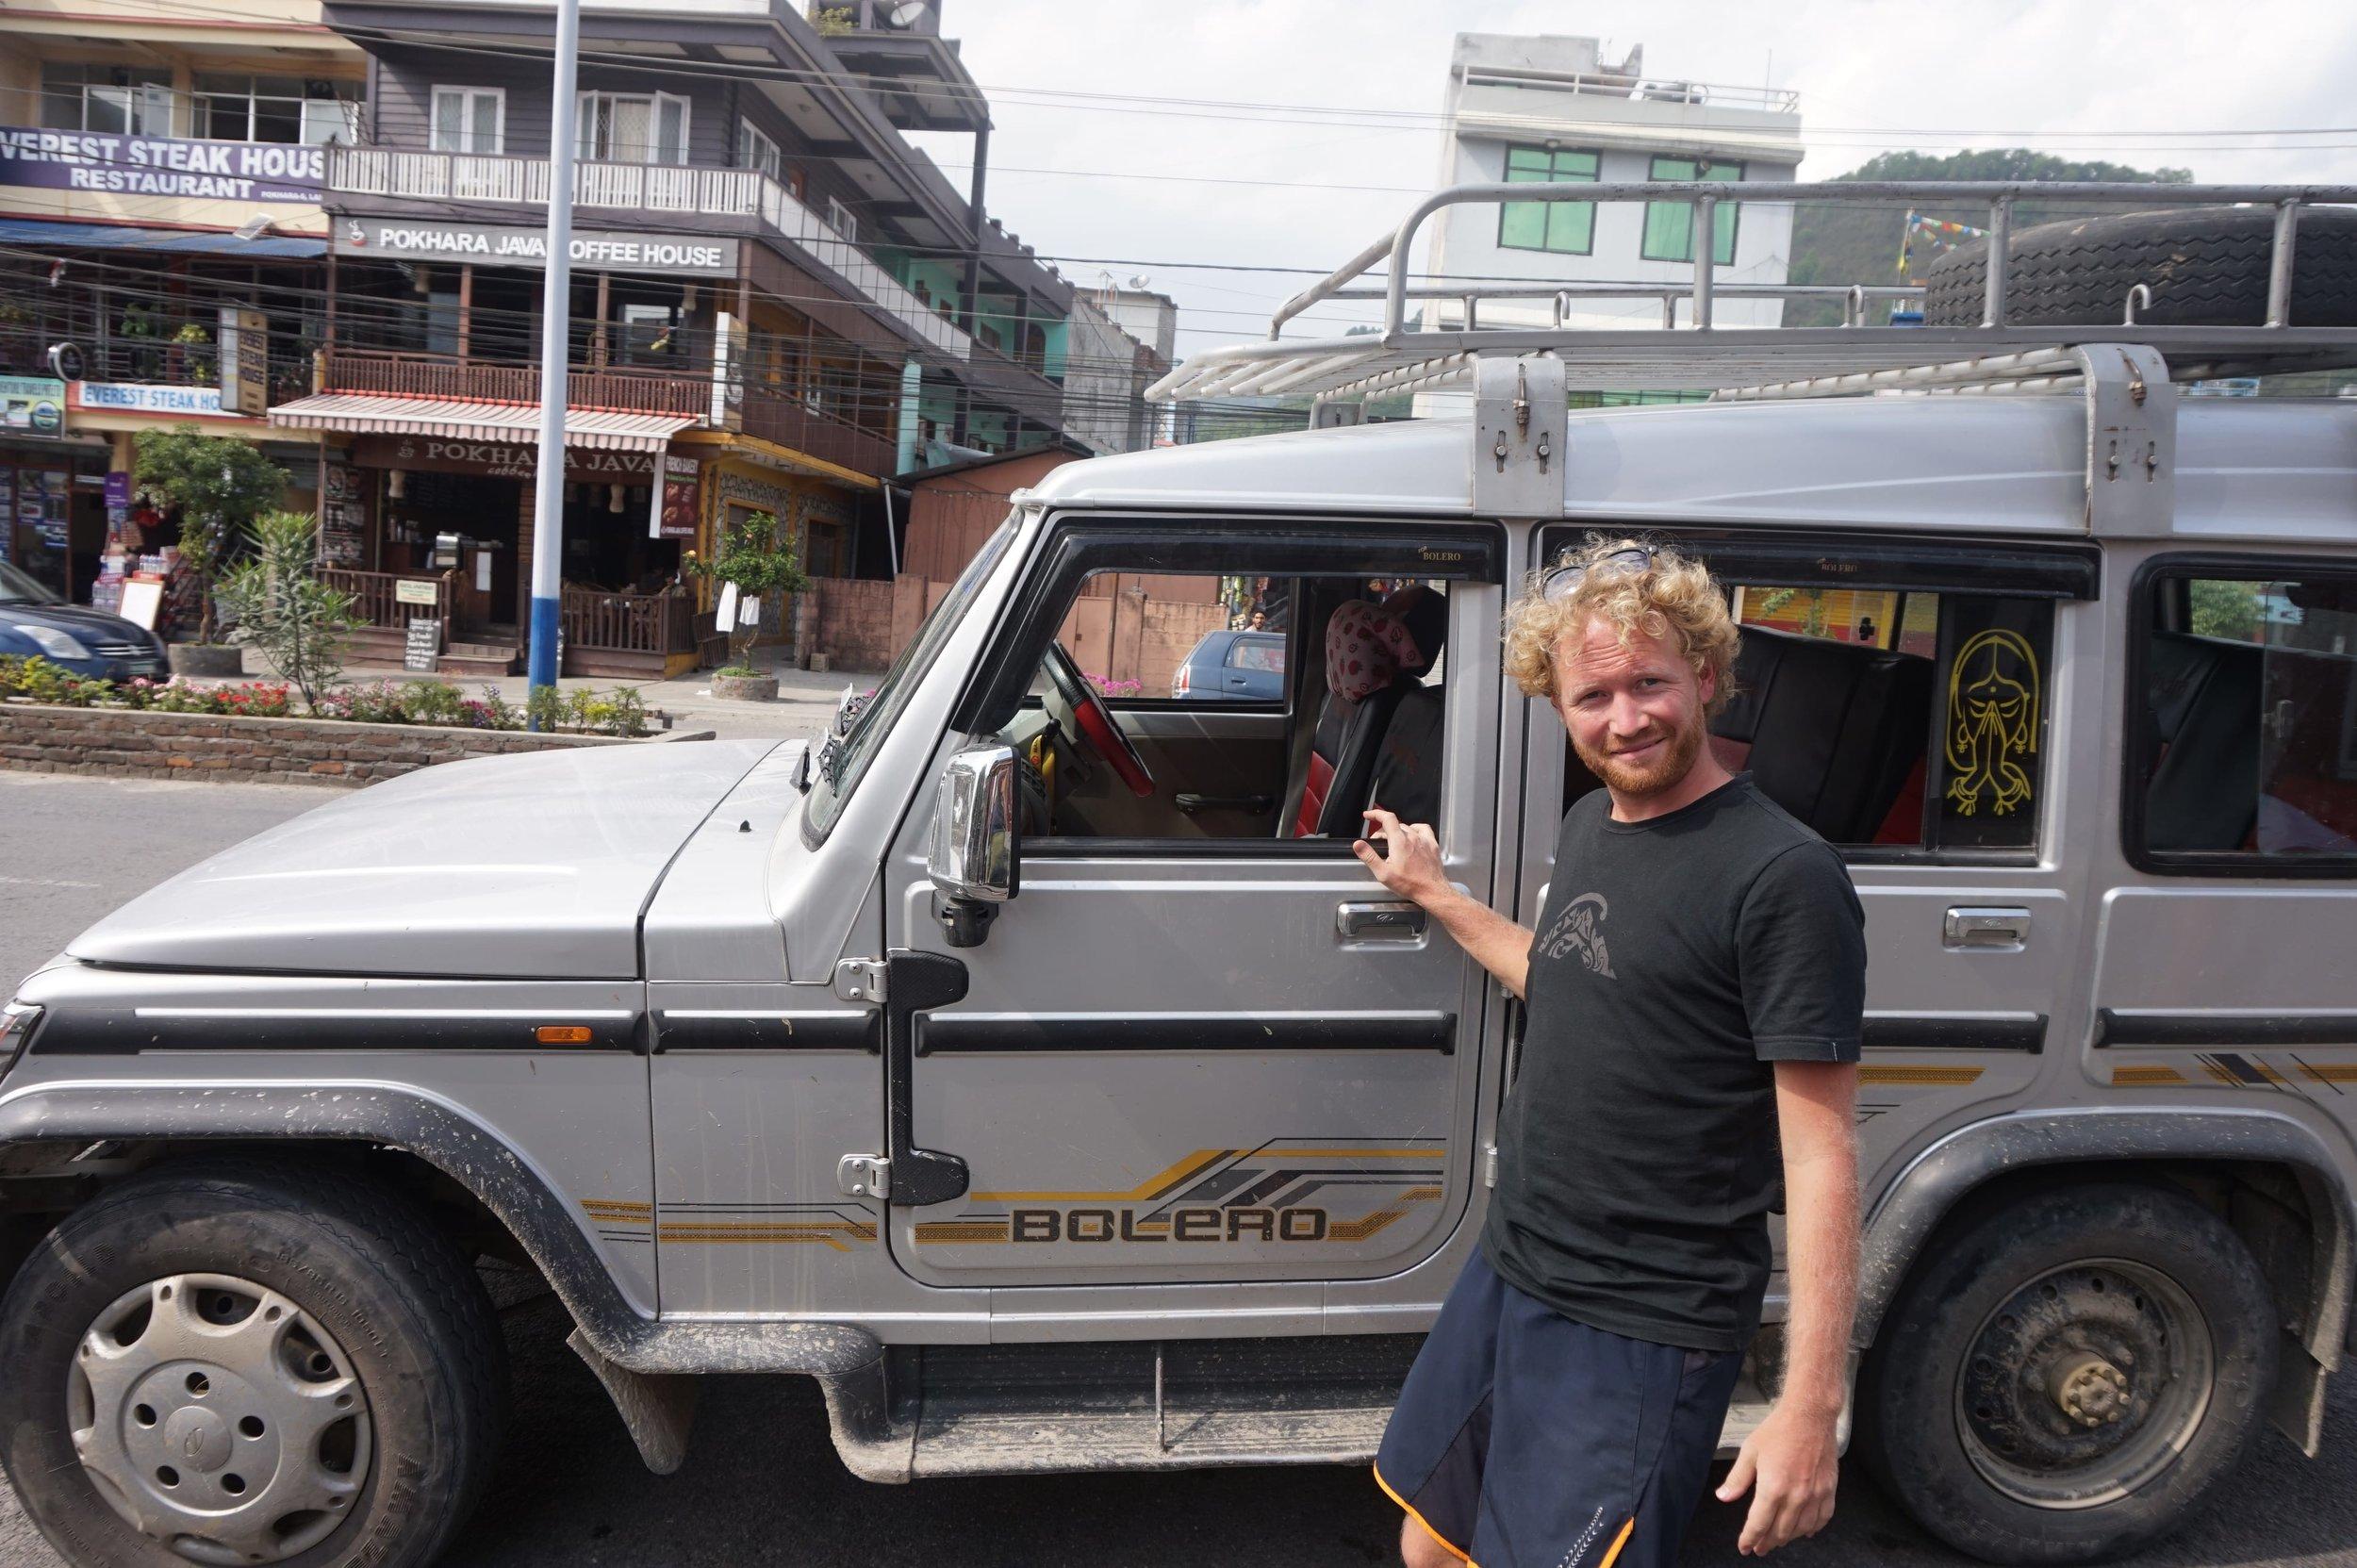 Transport from Pokhara to the beginning of the Annapurna trek